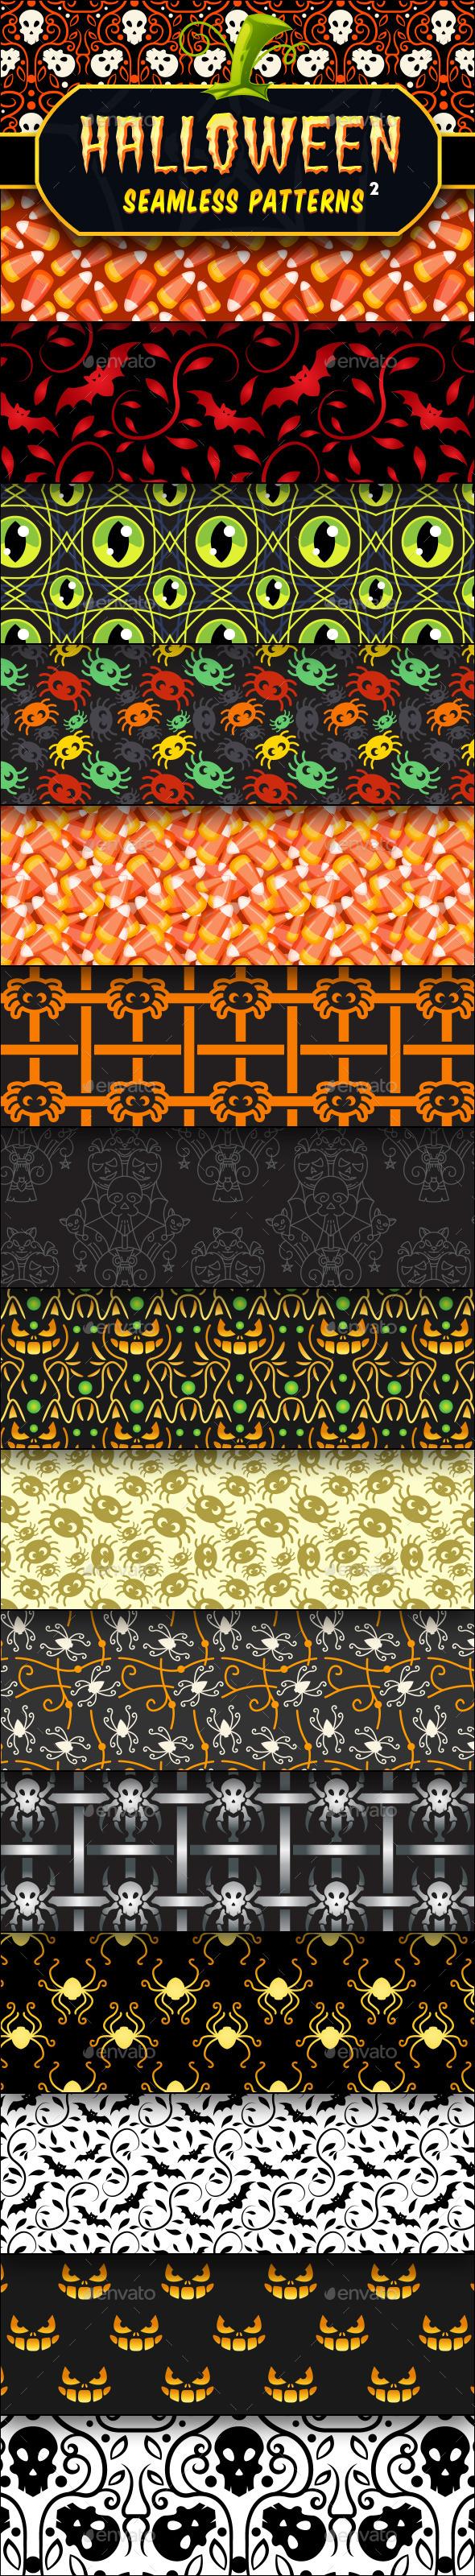 Halloween Seamless Patterns Set 2 - Halloween Seasons/Holidays